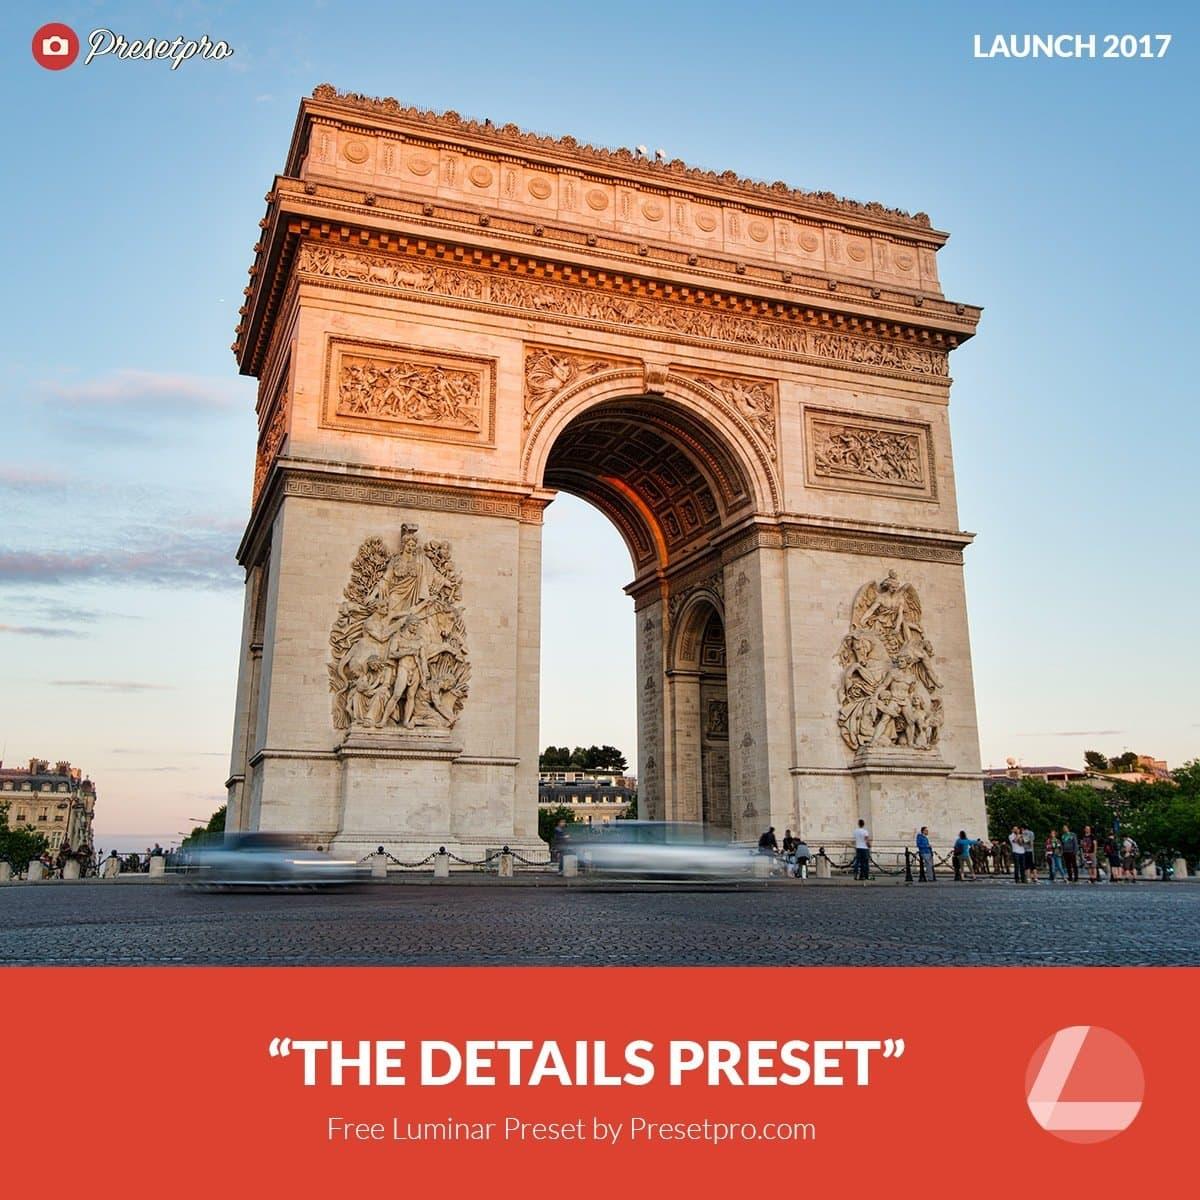 Free-Luminar-Preset-Details